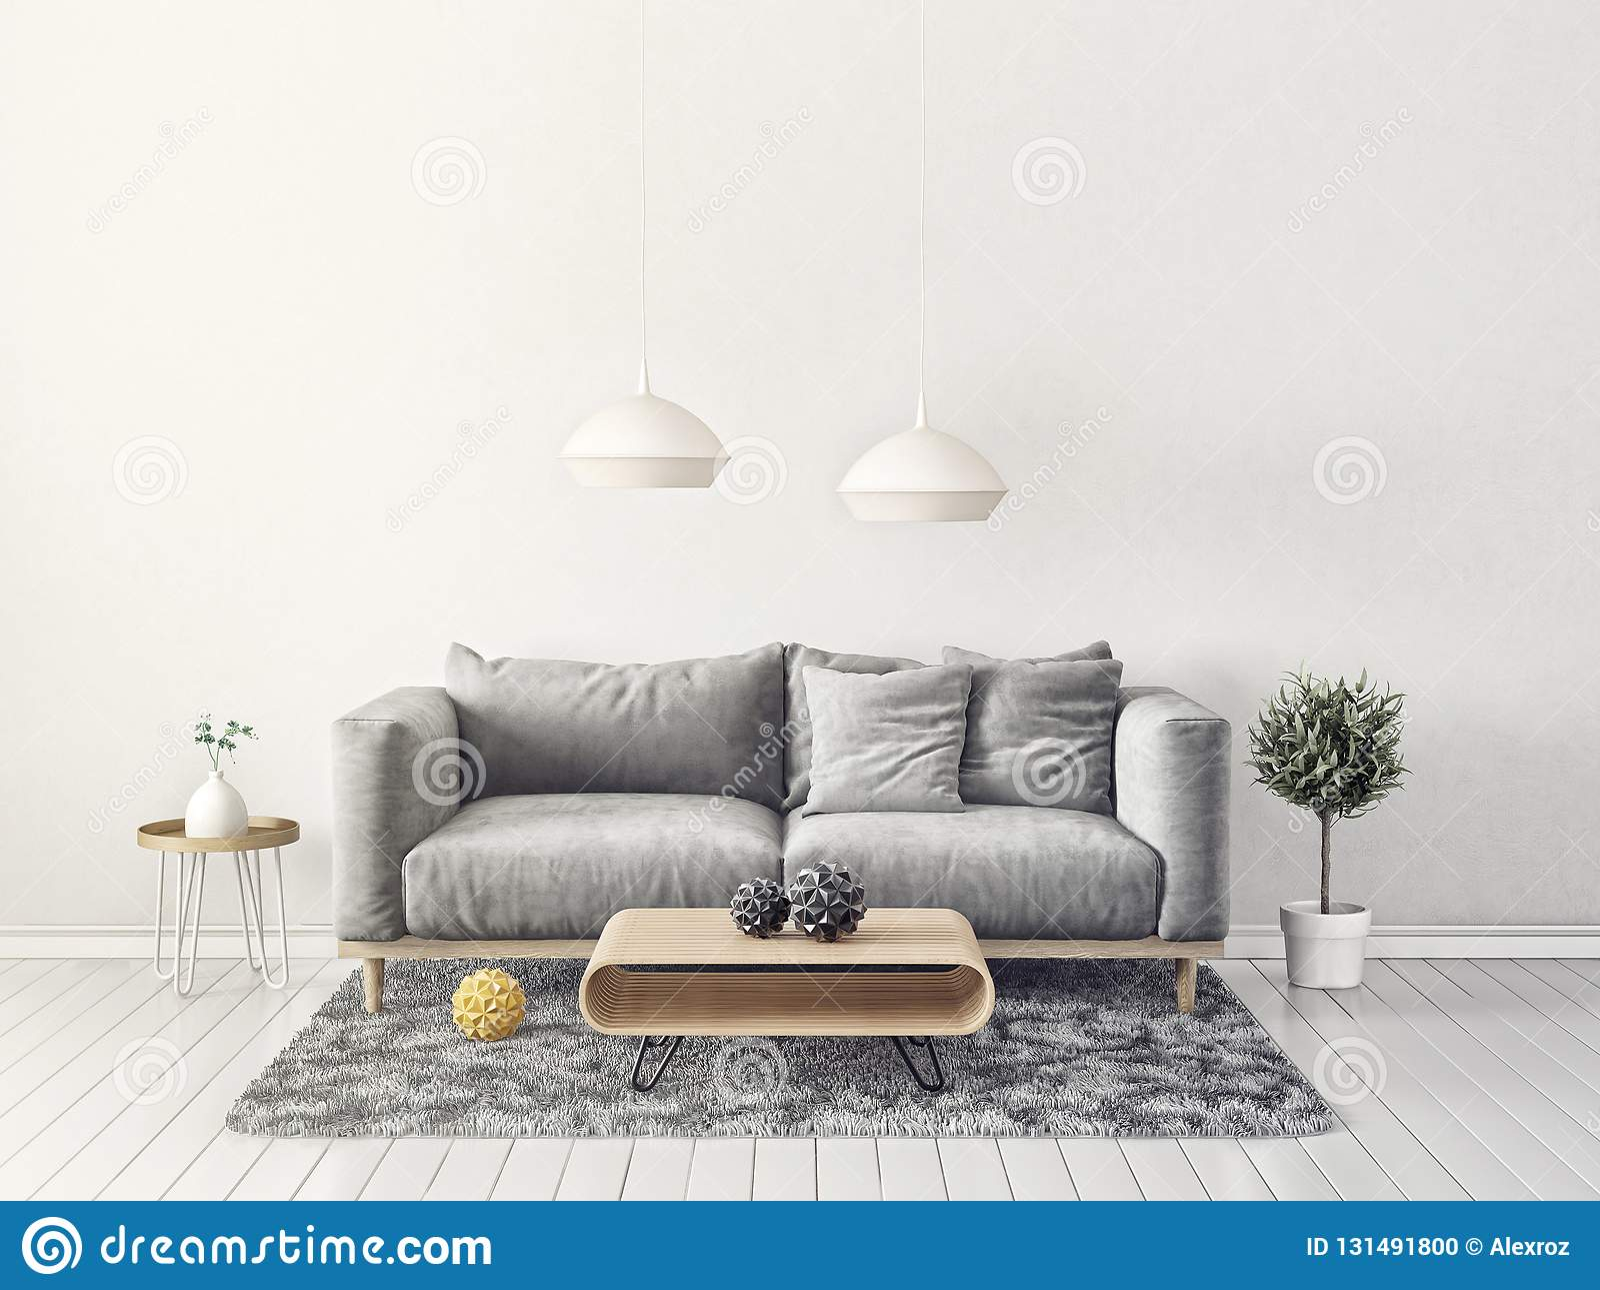 Modern Living Room With Sofa And Lamp Scandinavian Interior